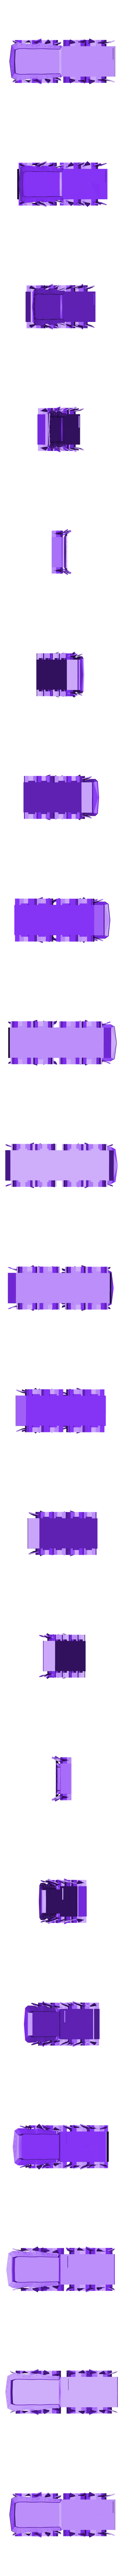 chassi.stl Download free STL file KustomWagon (blown apart) • 3D printable object, Savex